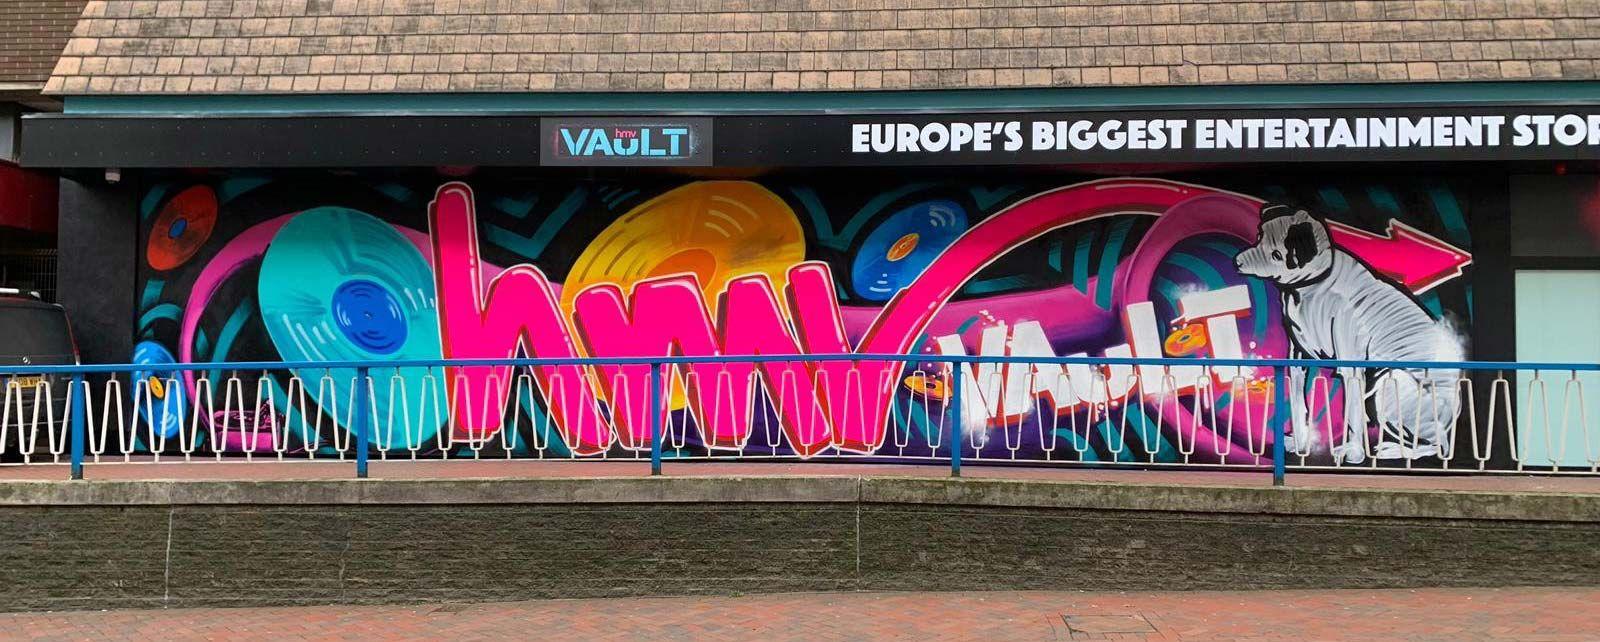 HMV-Wall-Graffiti